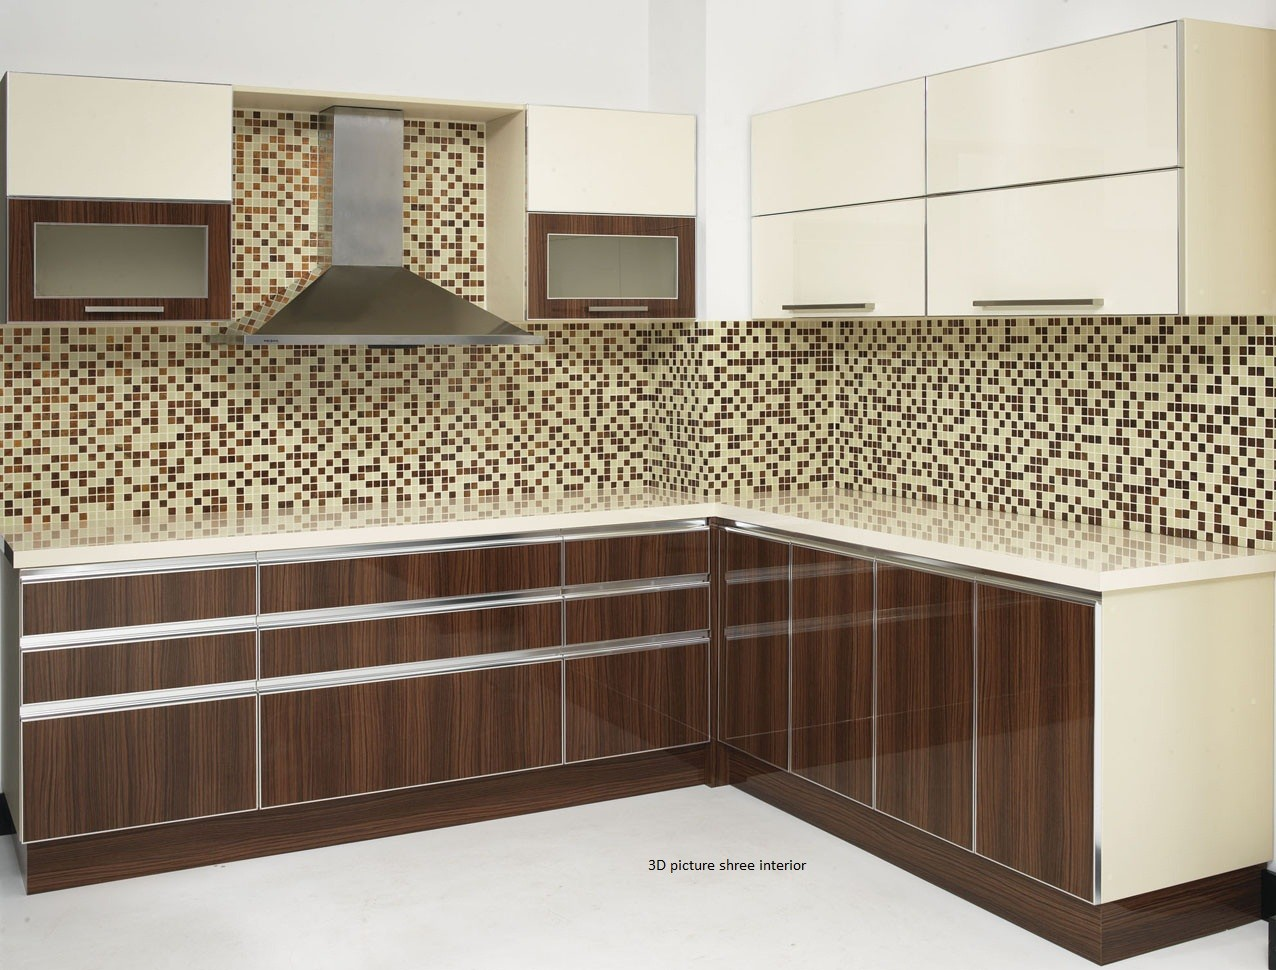 kitchen furniture images. Unique Kitchen Kitchen Furniture On Images E